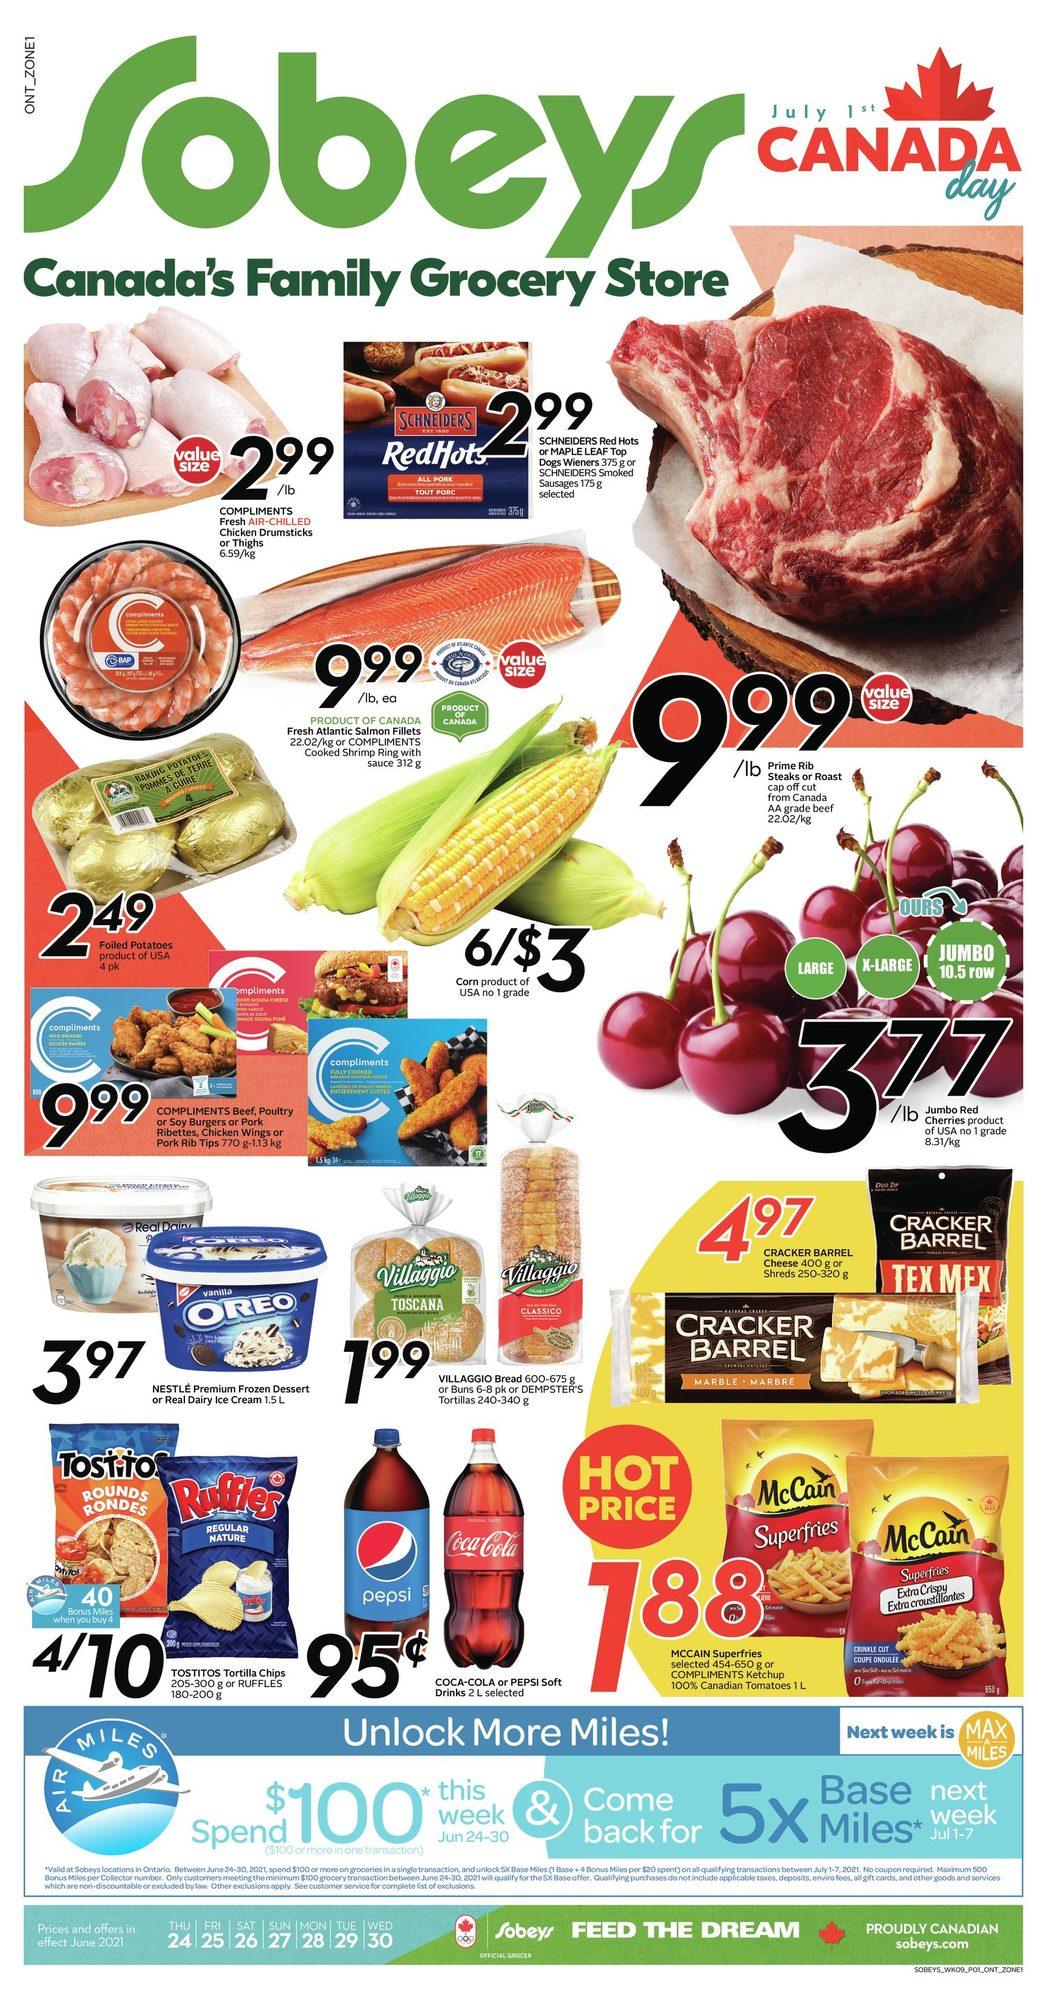 Sobeys - Weekly Flyer Specials